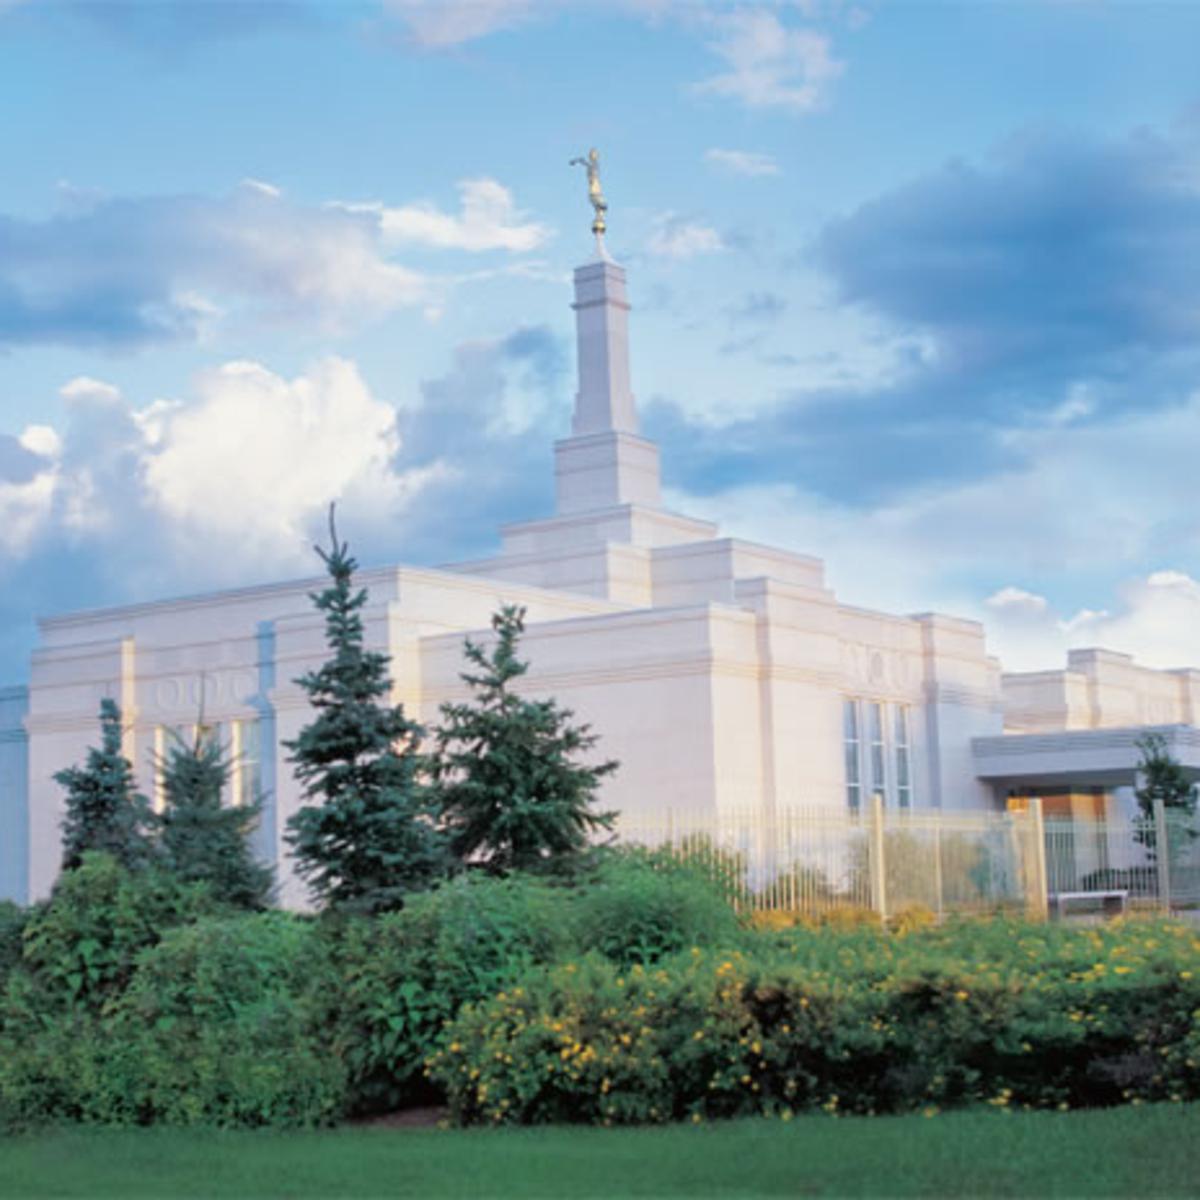 Image of the Regina Saskatchewan Mormon Temple